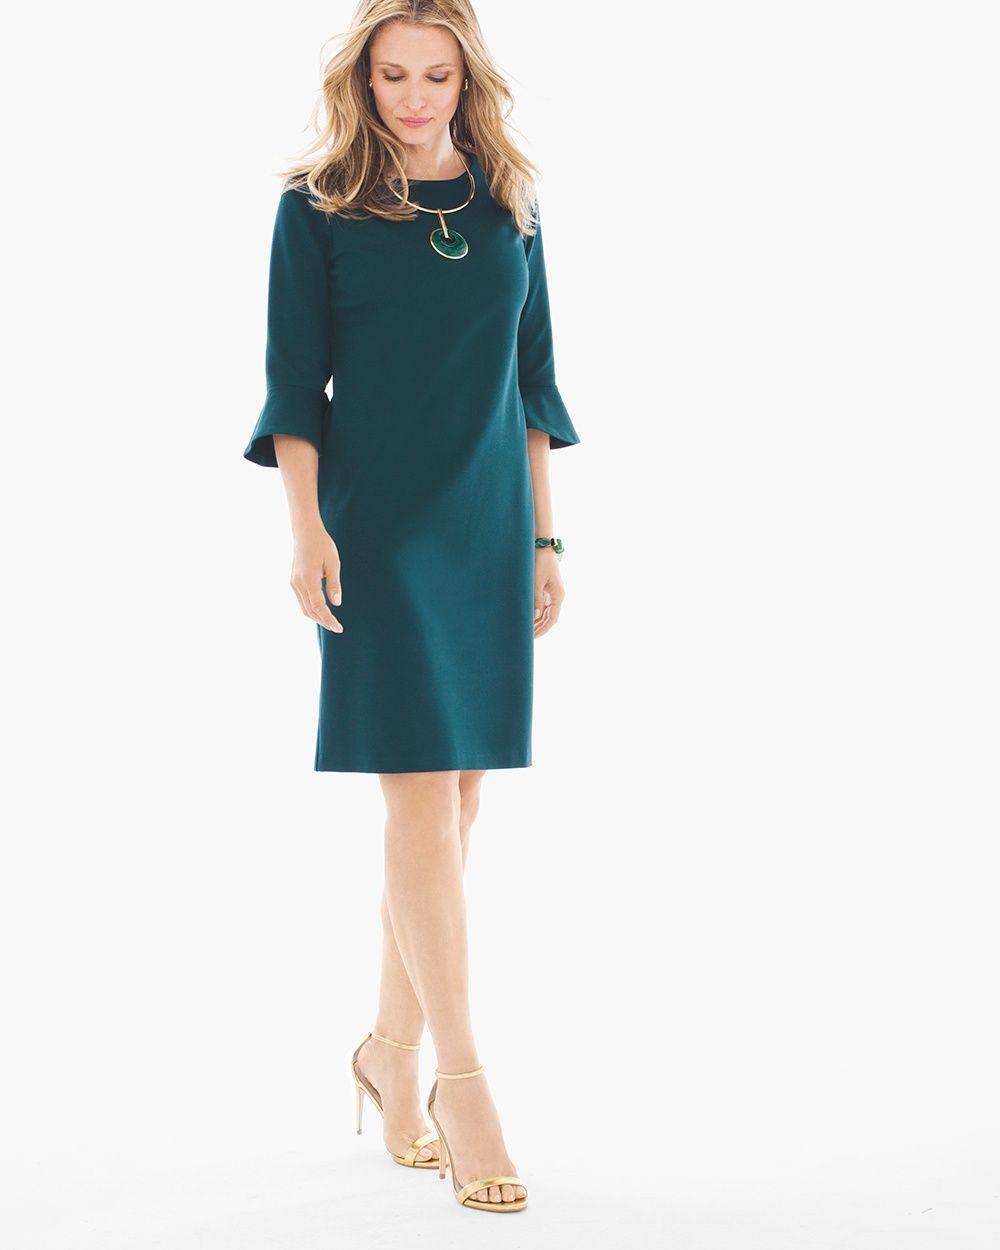 Chico's Women's Ponte Bell-Sleeve Short Dress in Swiss Pine, Swiss Pine, Size: 3.5 (18 - XL)